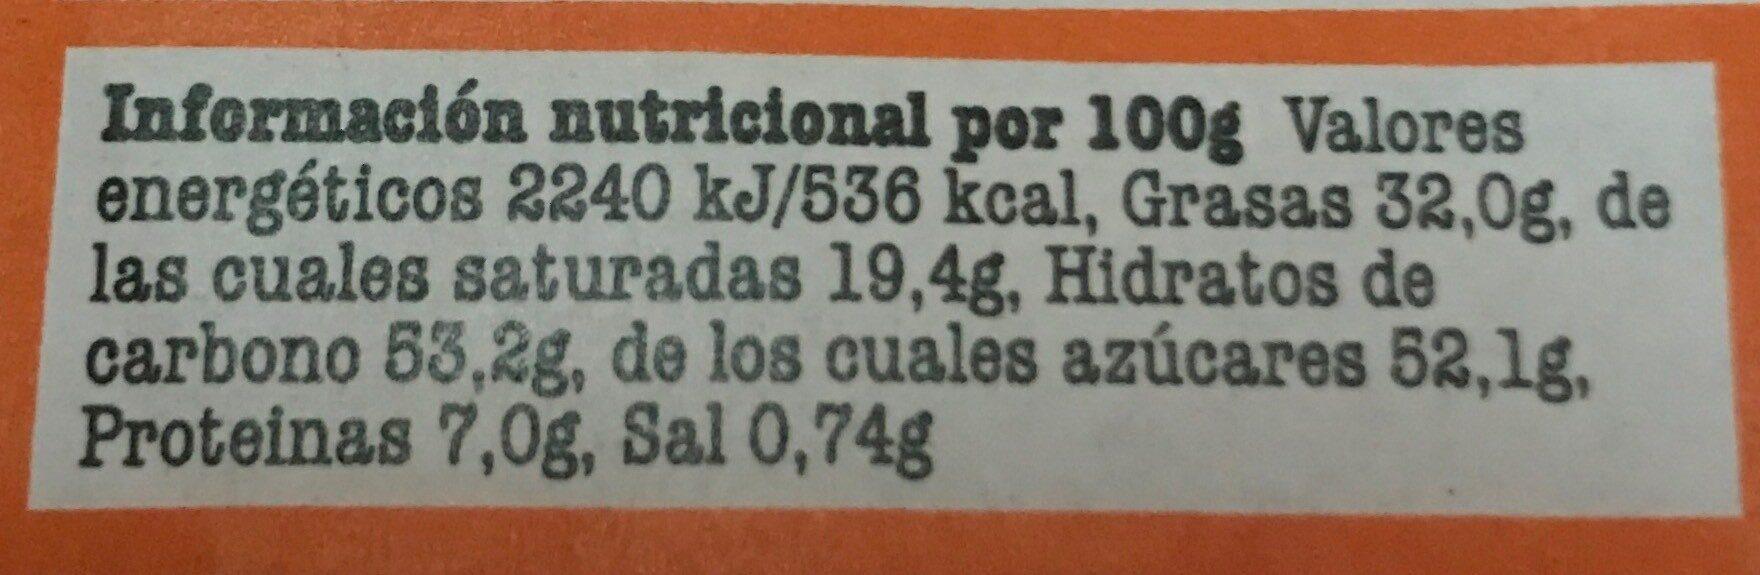 Chocolate Caramel sea salt - Nutrition facts